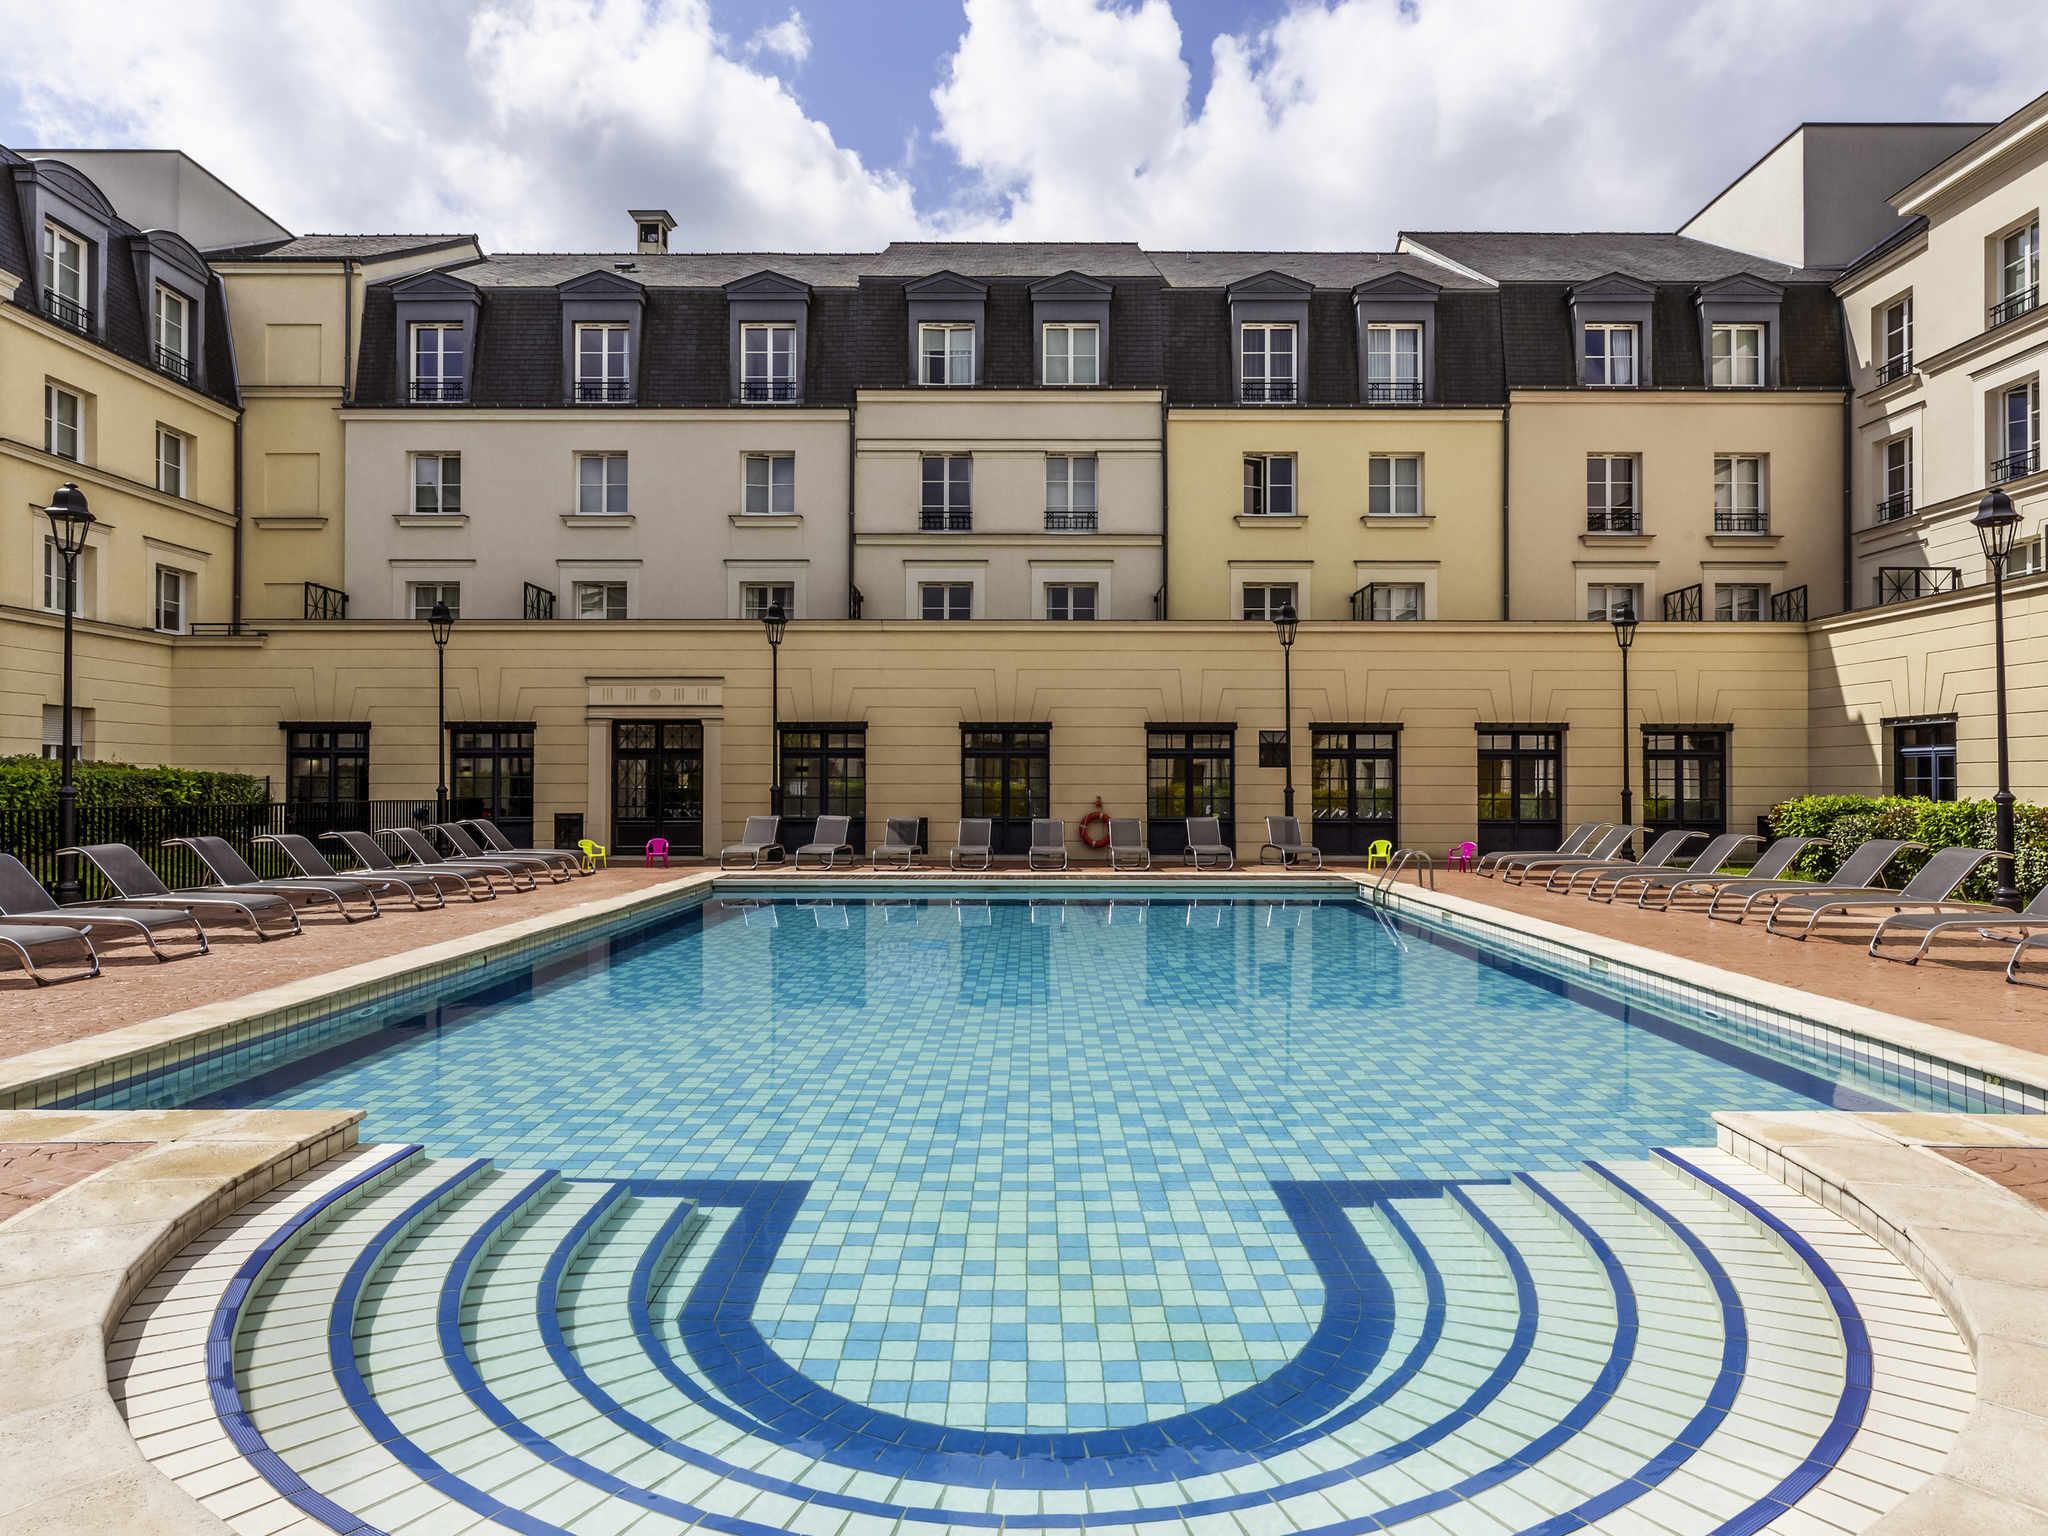 Hotell – Hipark by Adagio Serris - Val d'Europe